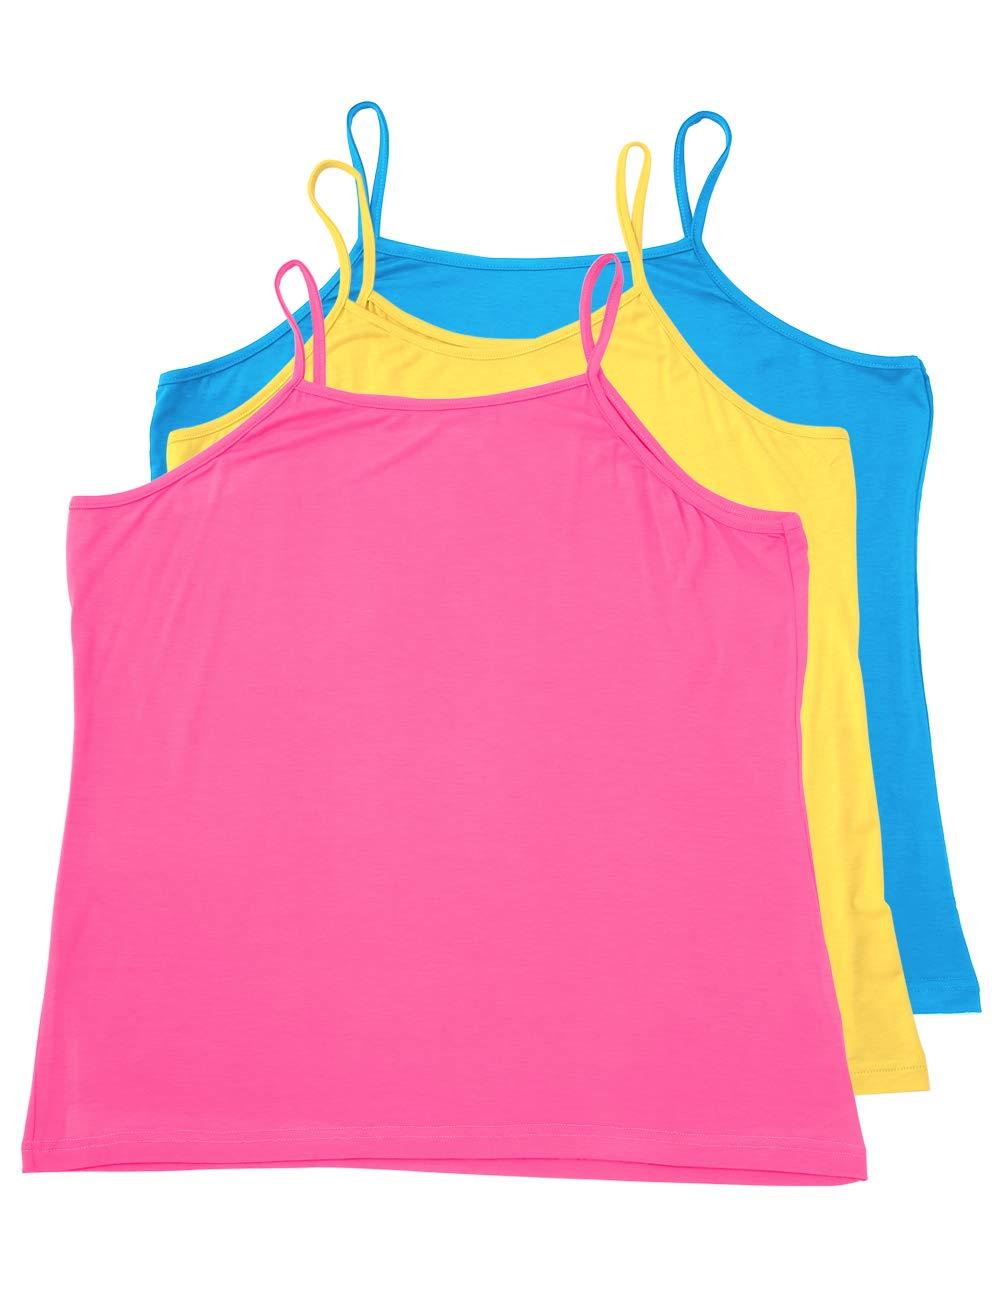 VIKIDEER 3 Pack Camisole for Women Plus Size Basic Undershirt Spaghetti Strap Cami Tank Top